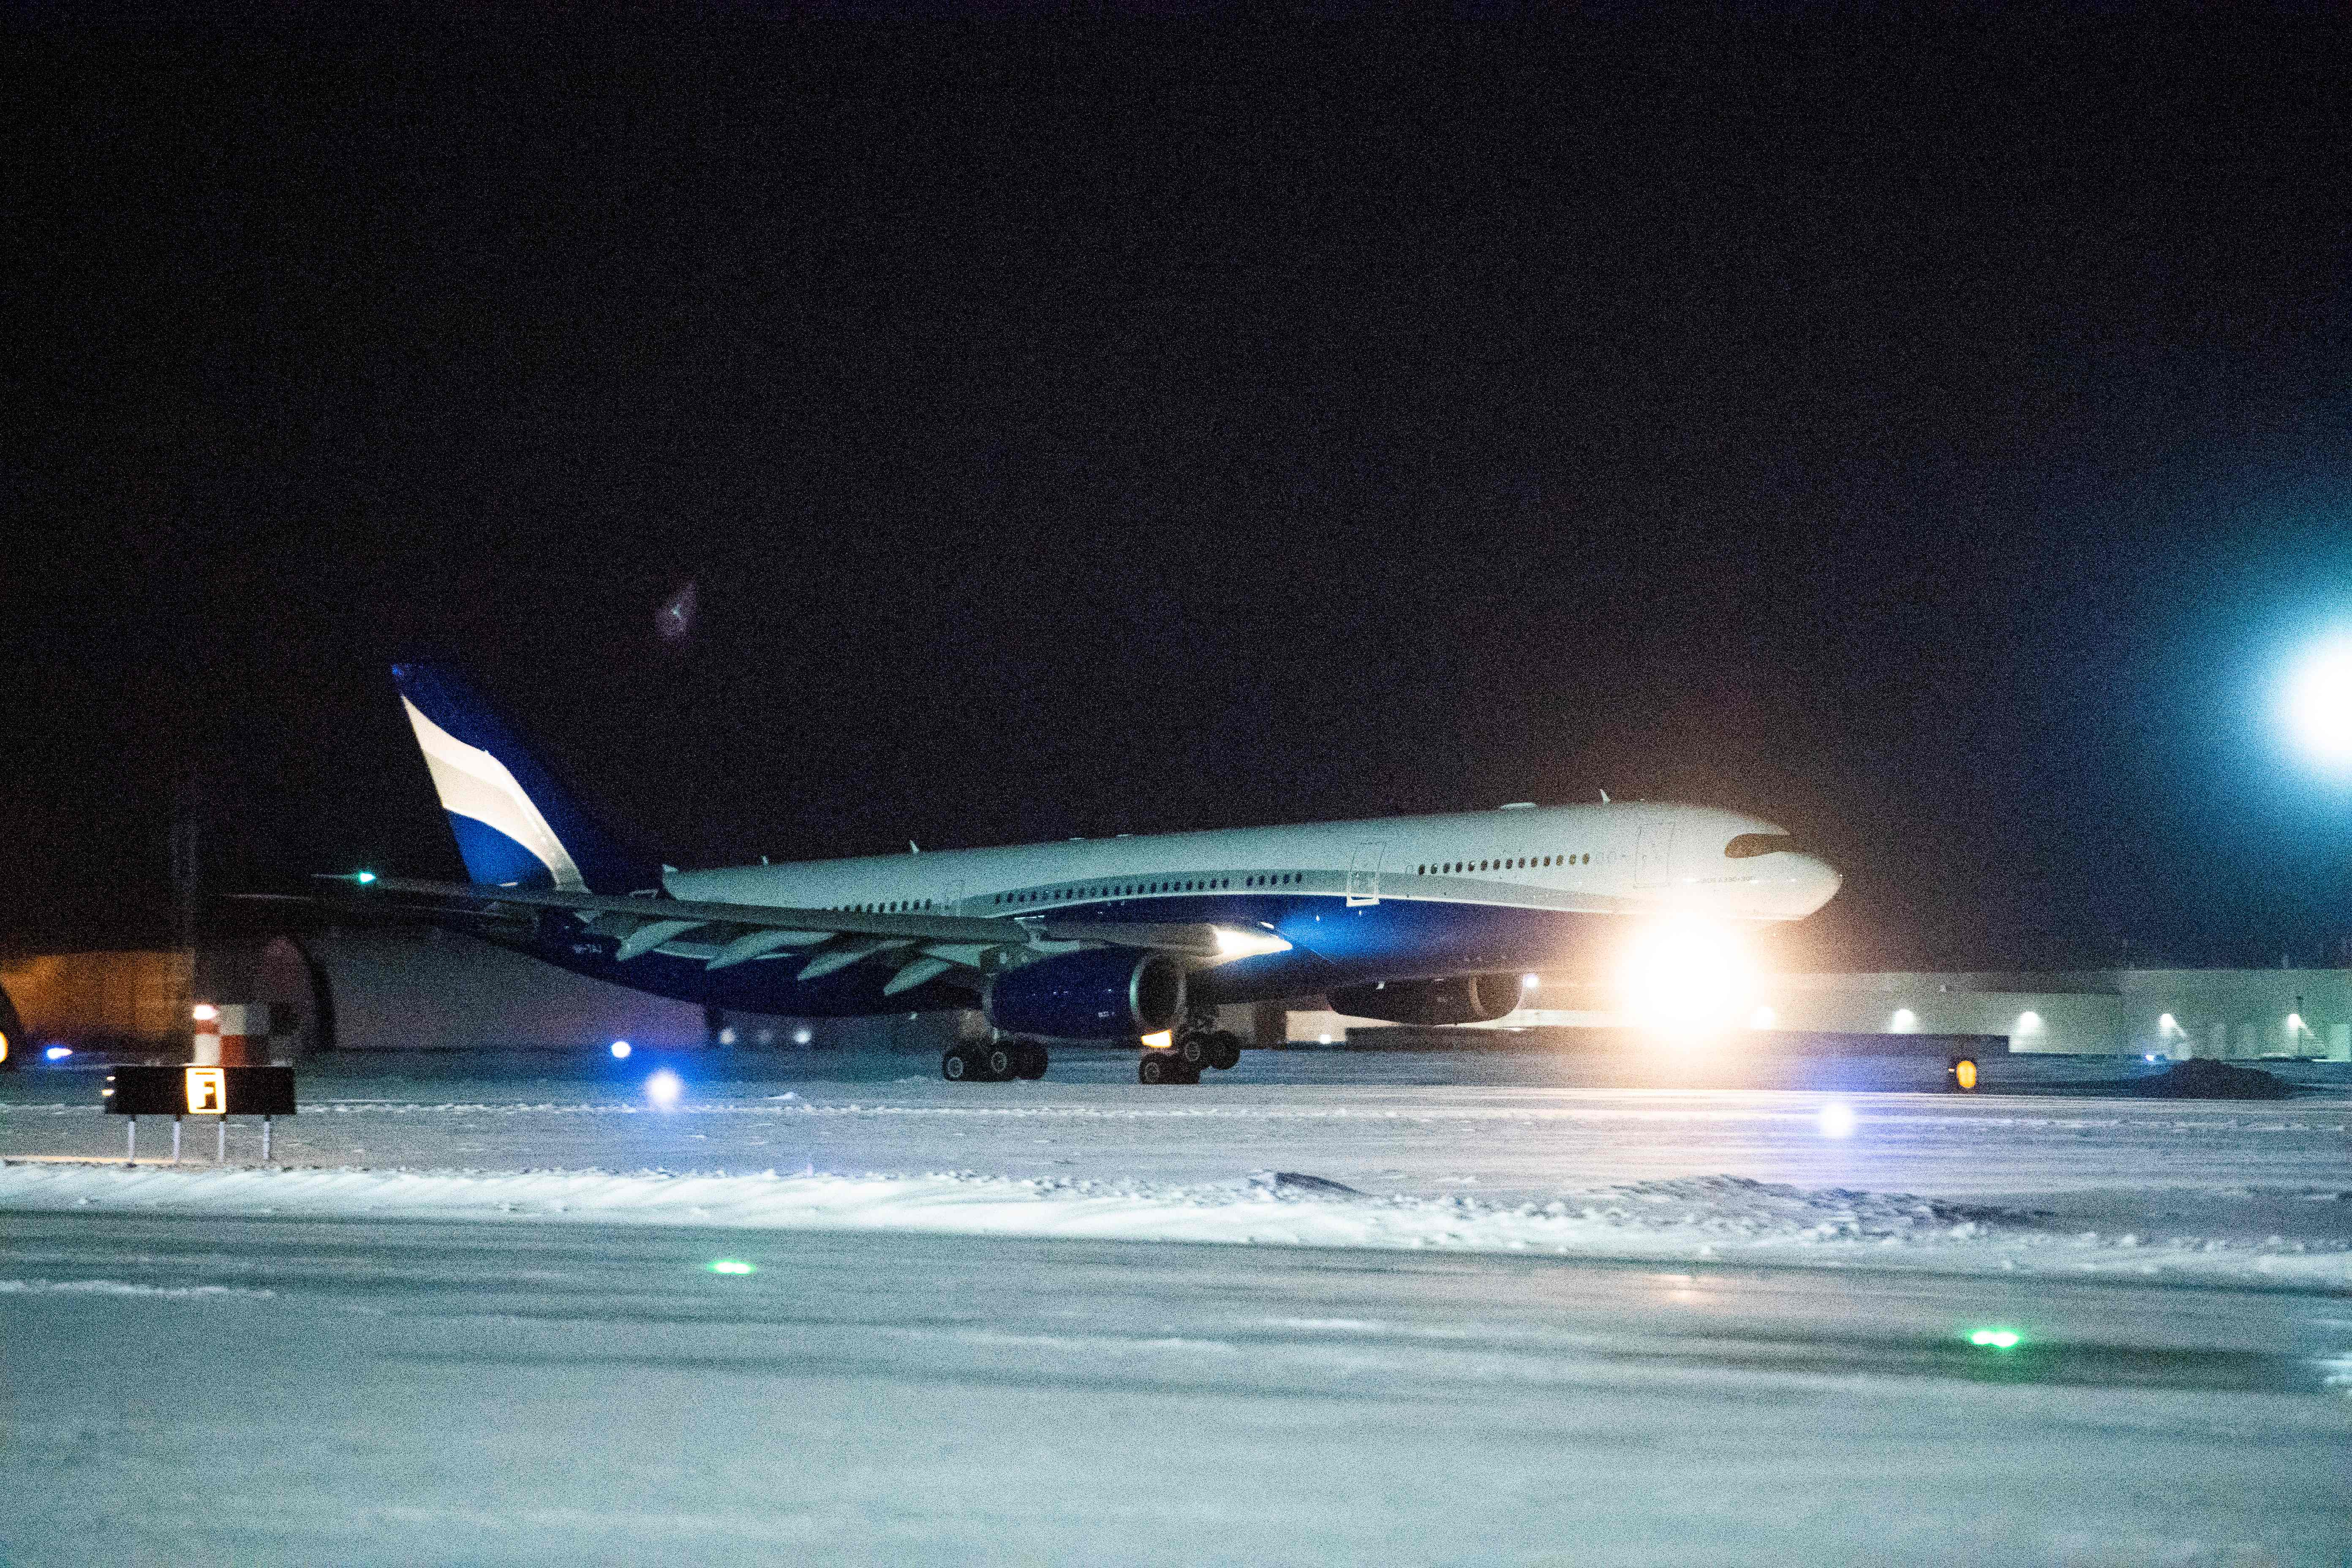 plane-carrying-Canadian-citizens-Coronavirus-Wuhan